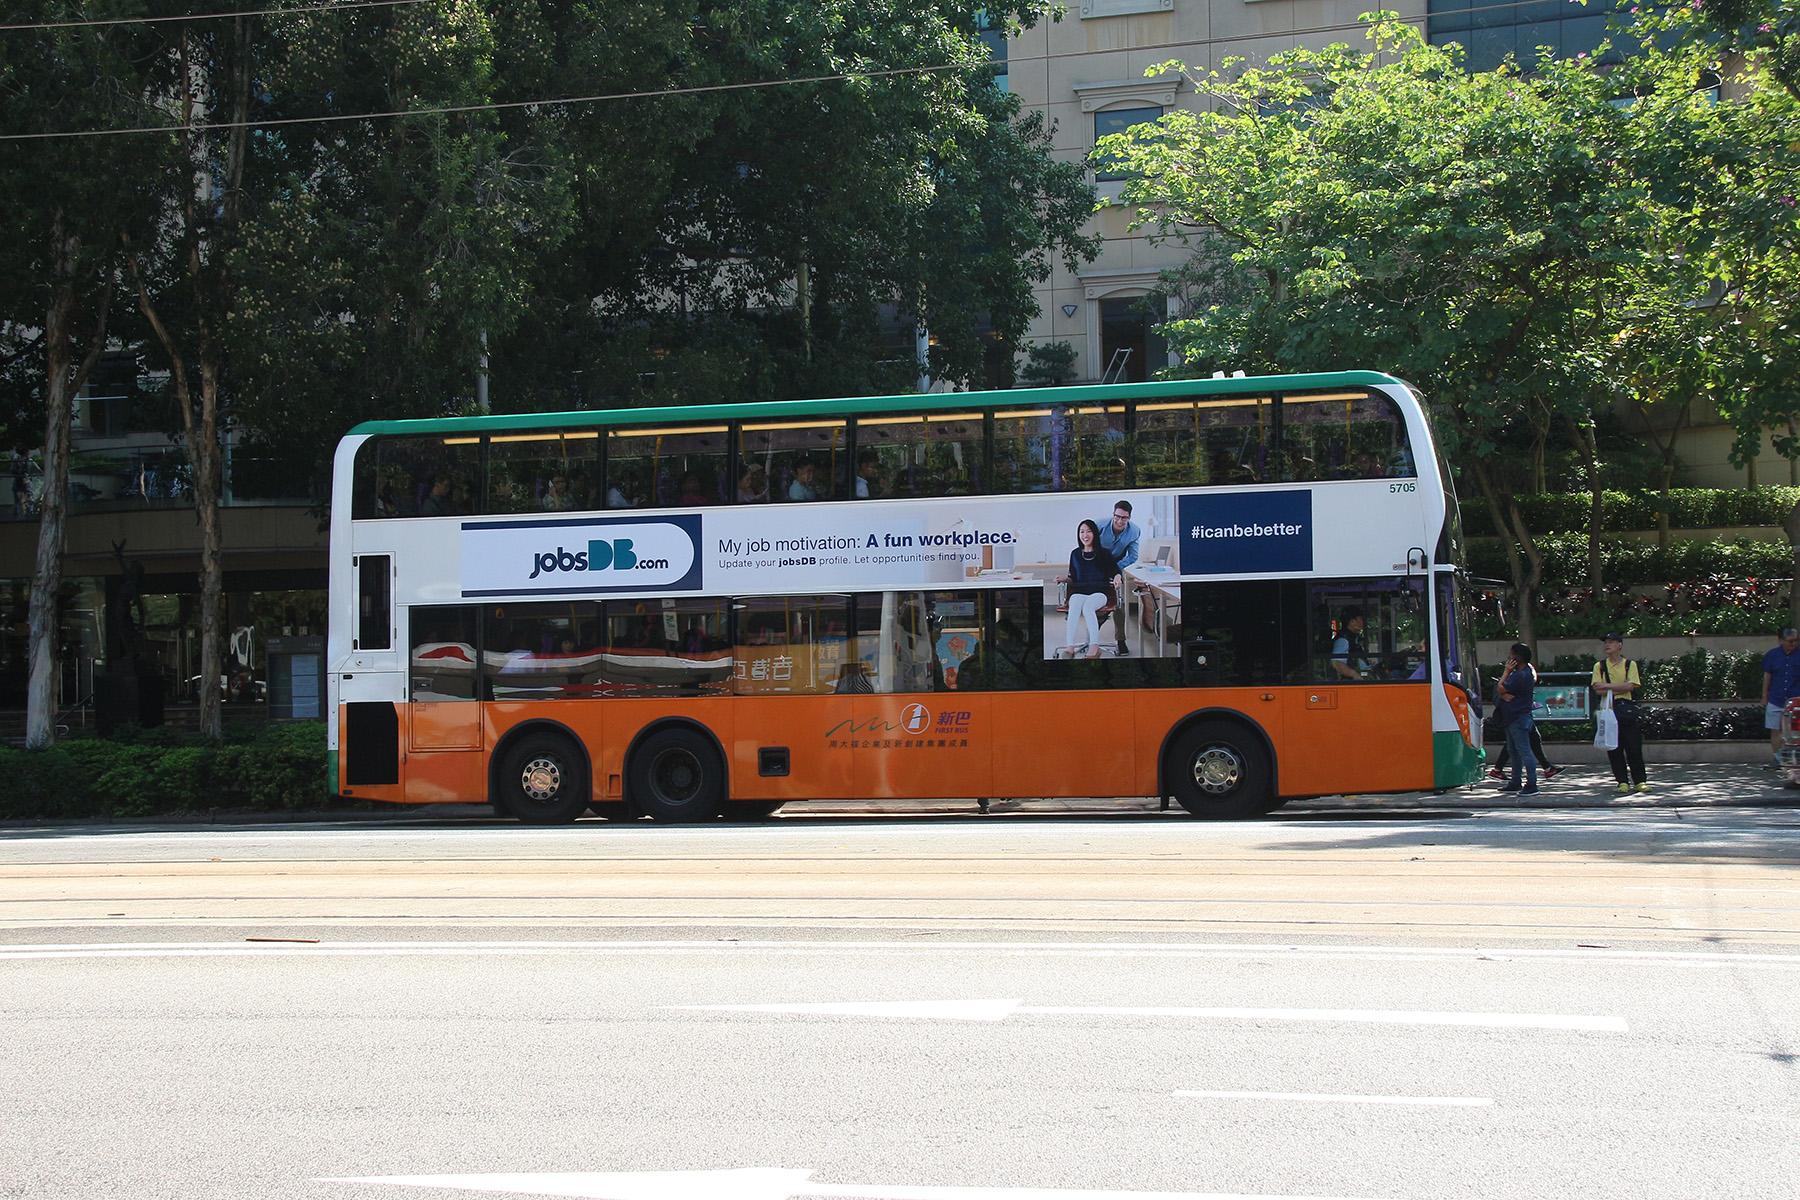 icanbebetter-bus